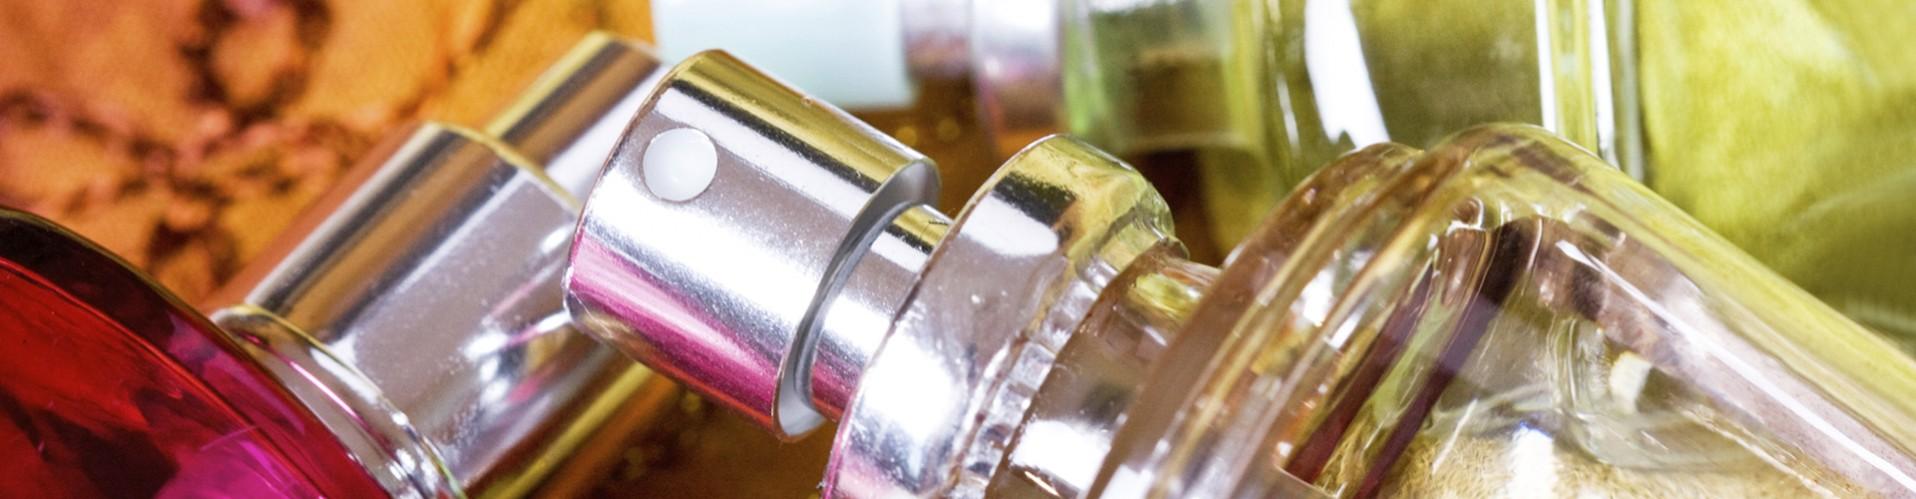 cosmetics-perfume-bottles-banner-new-1916x499.jpg